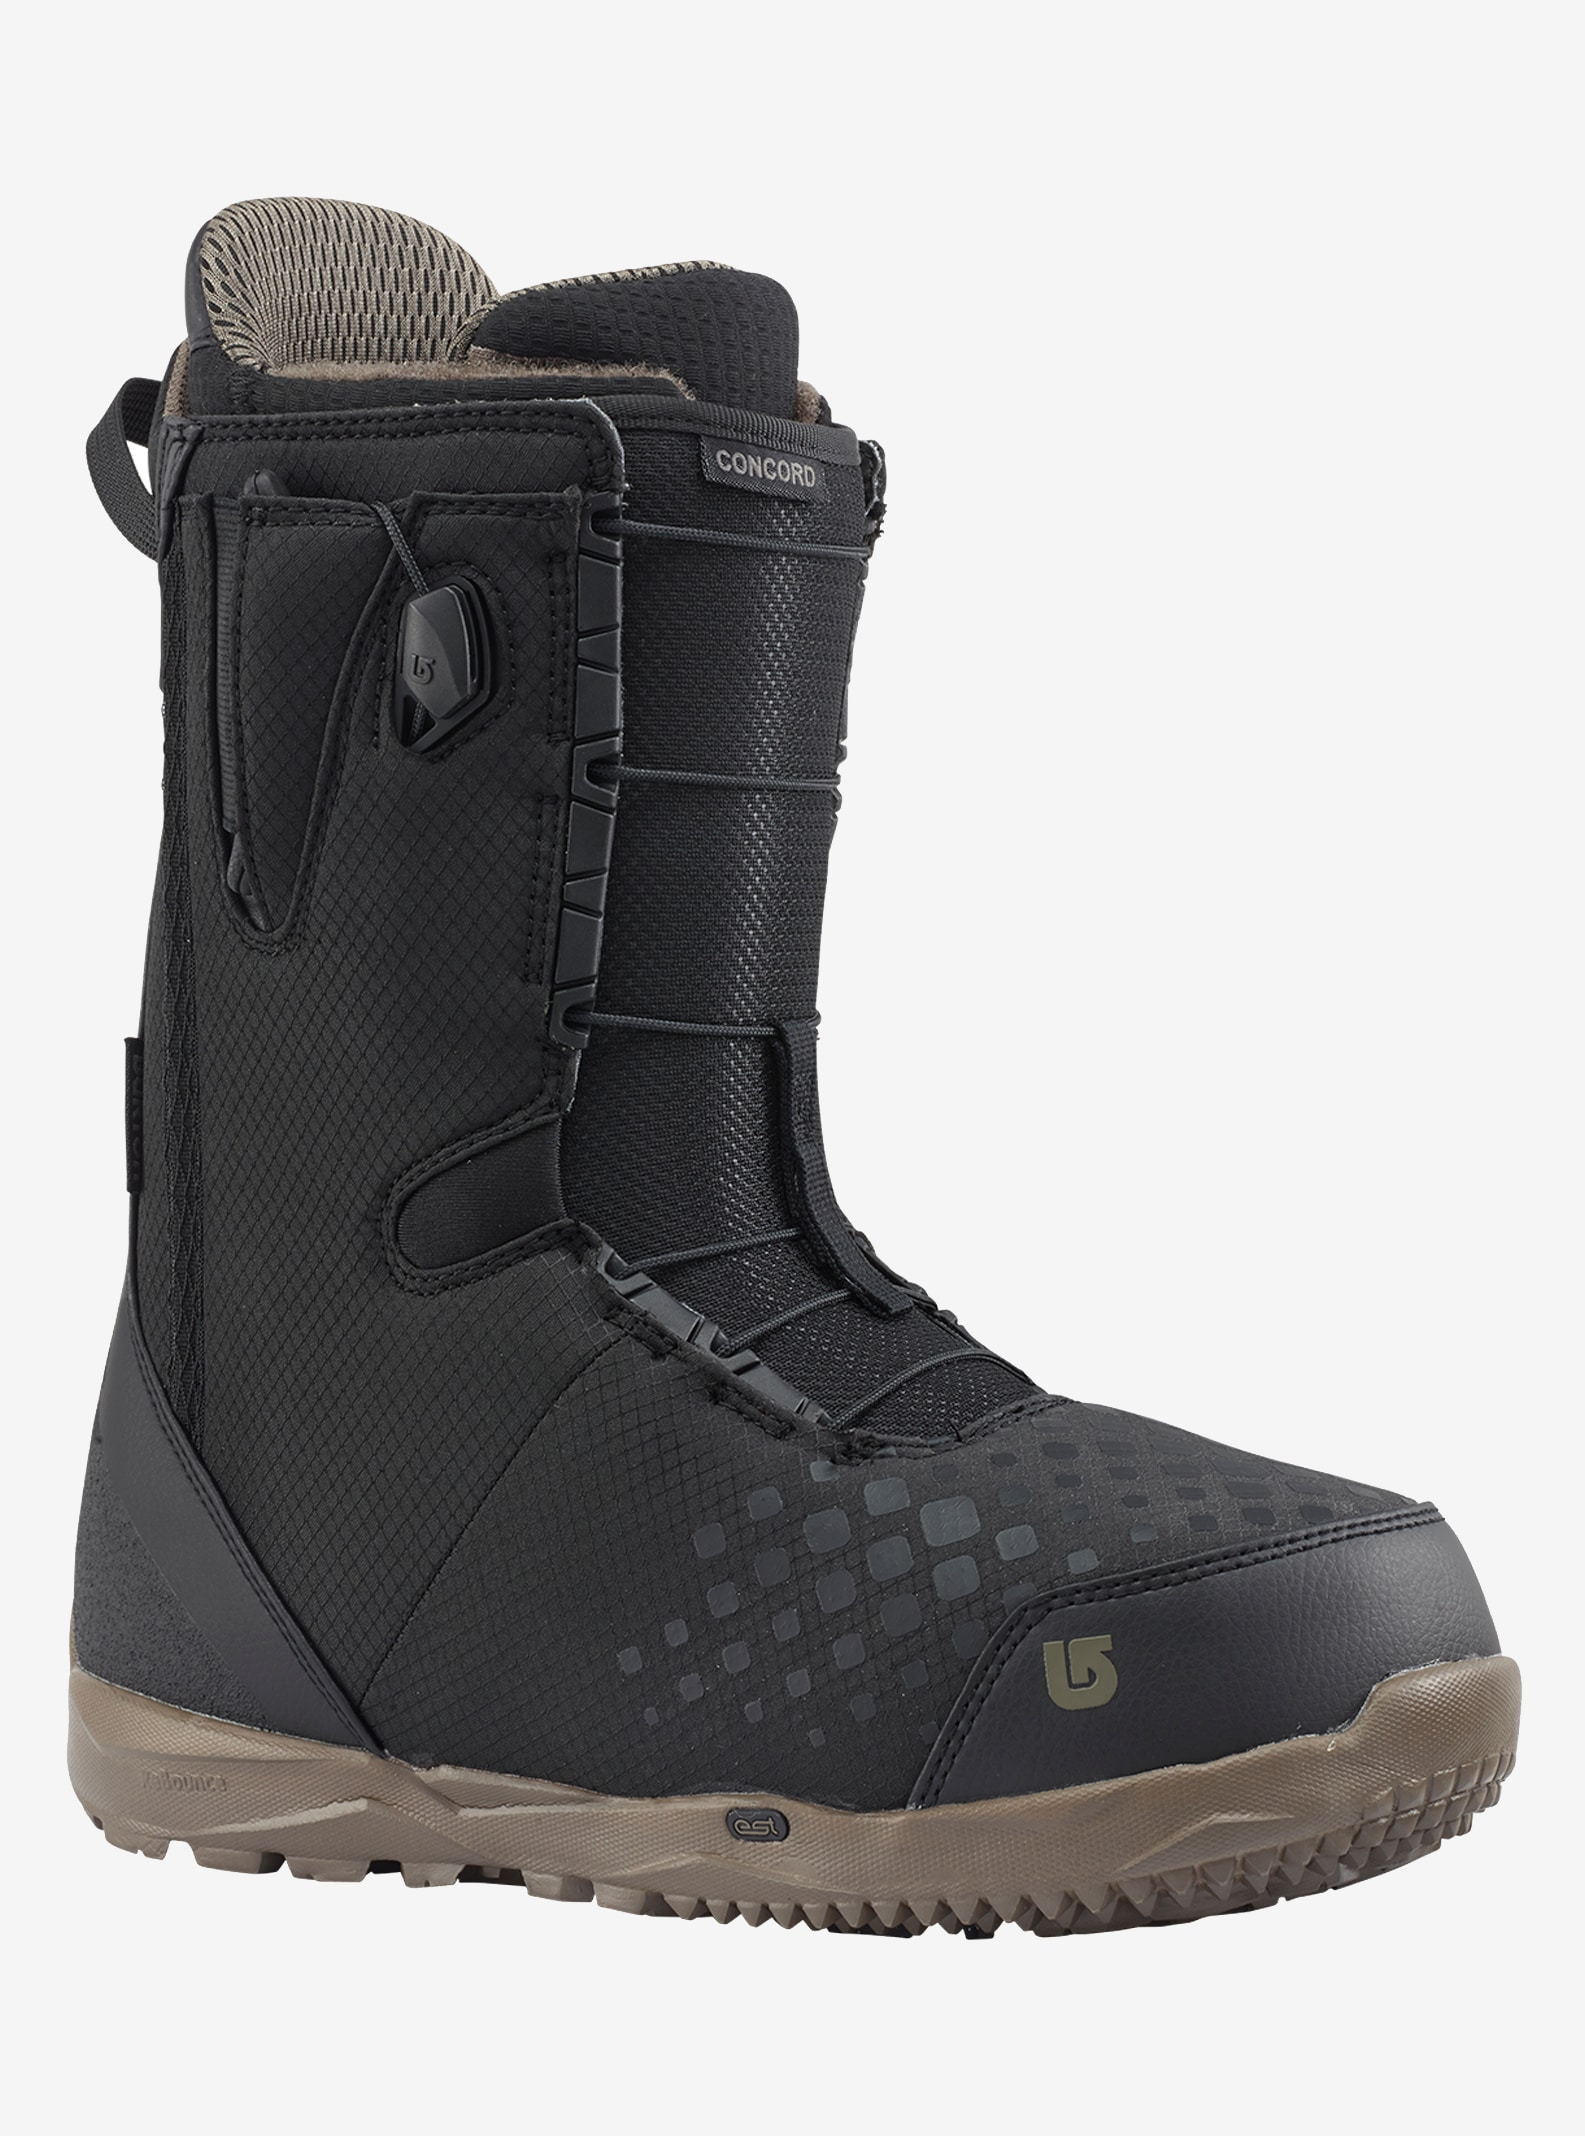 Men\'s Snowboard Boots   Burton Snowboards